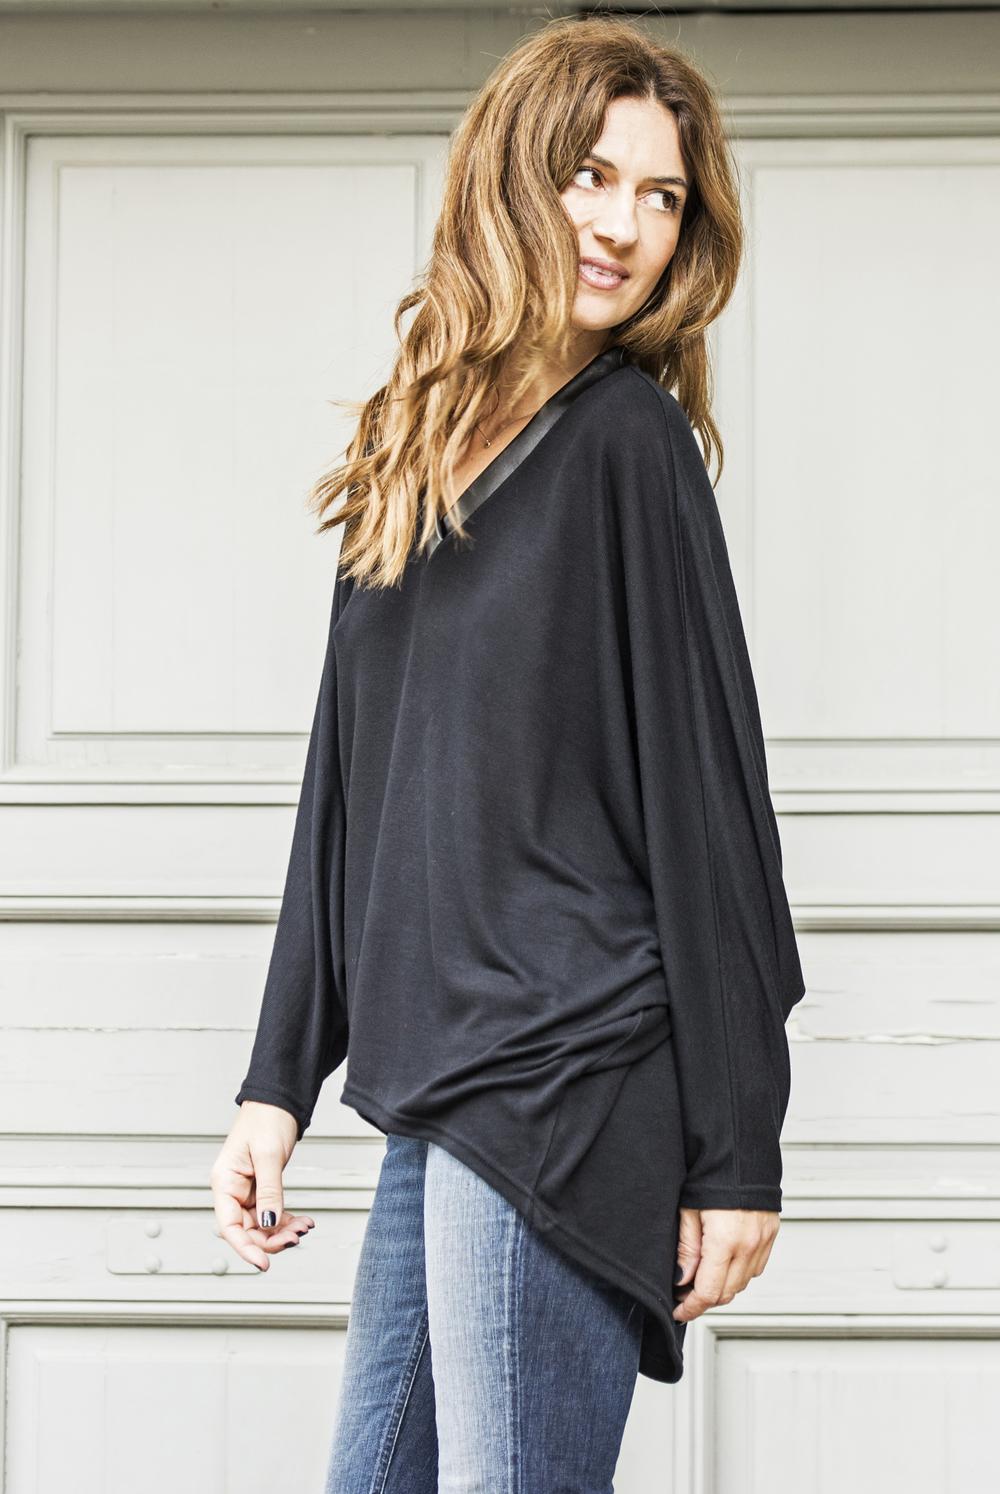 BLV Black V-neck loose blouse 3.jpg